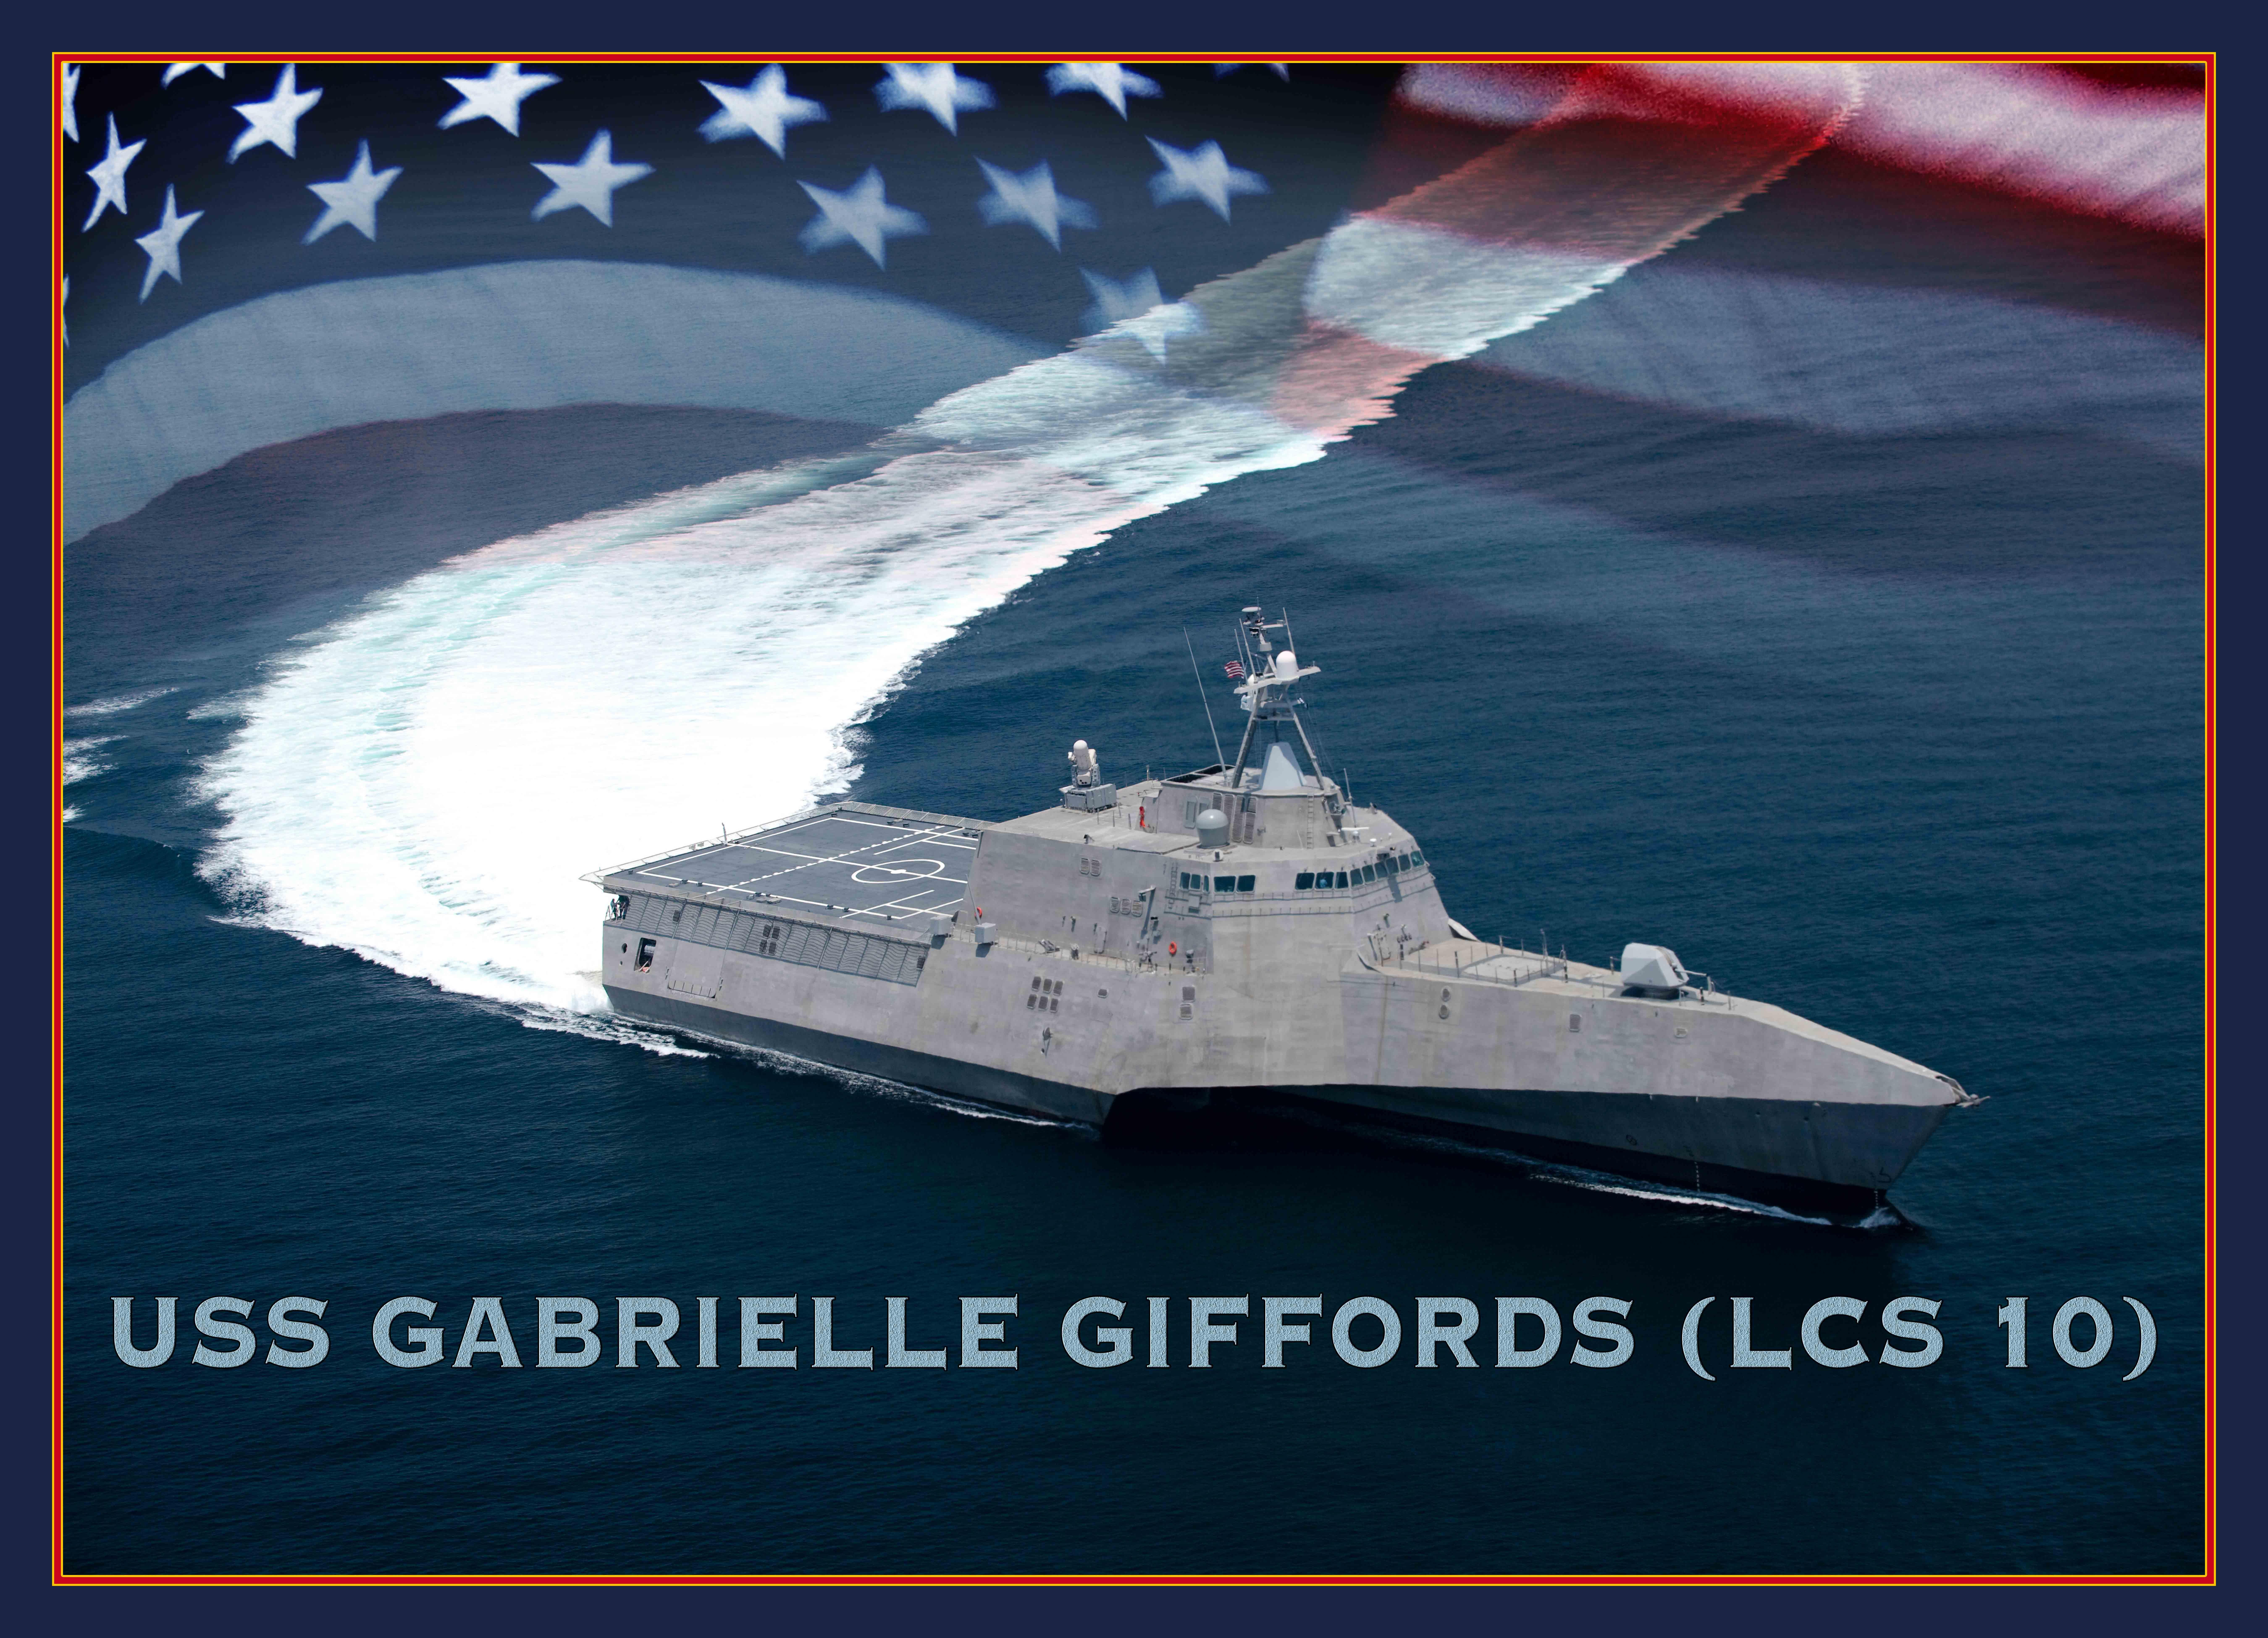 USS GABRIELLE GIFFORDS LCS-10 Grafik: U.S. Navy